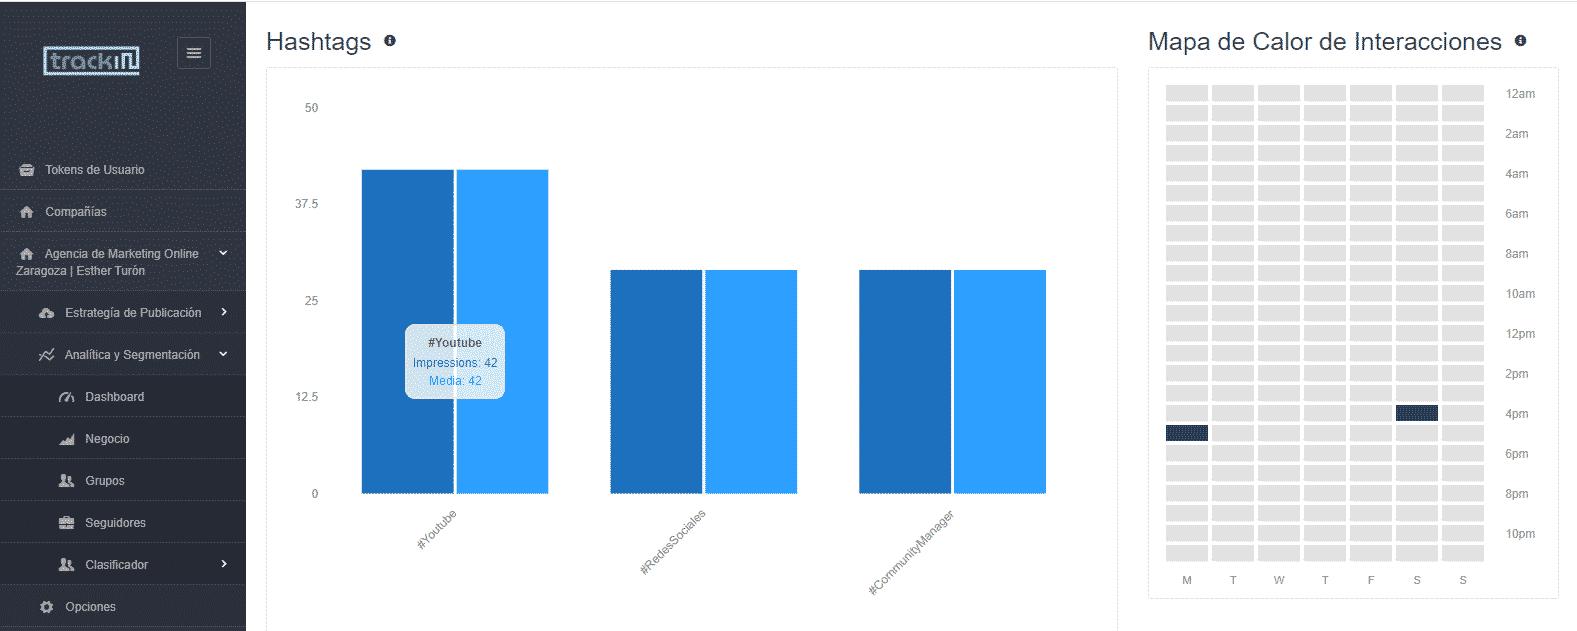 Dashboard Trackin hashtags y mapa de calor